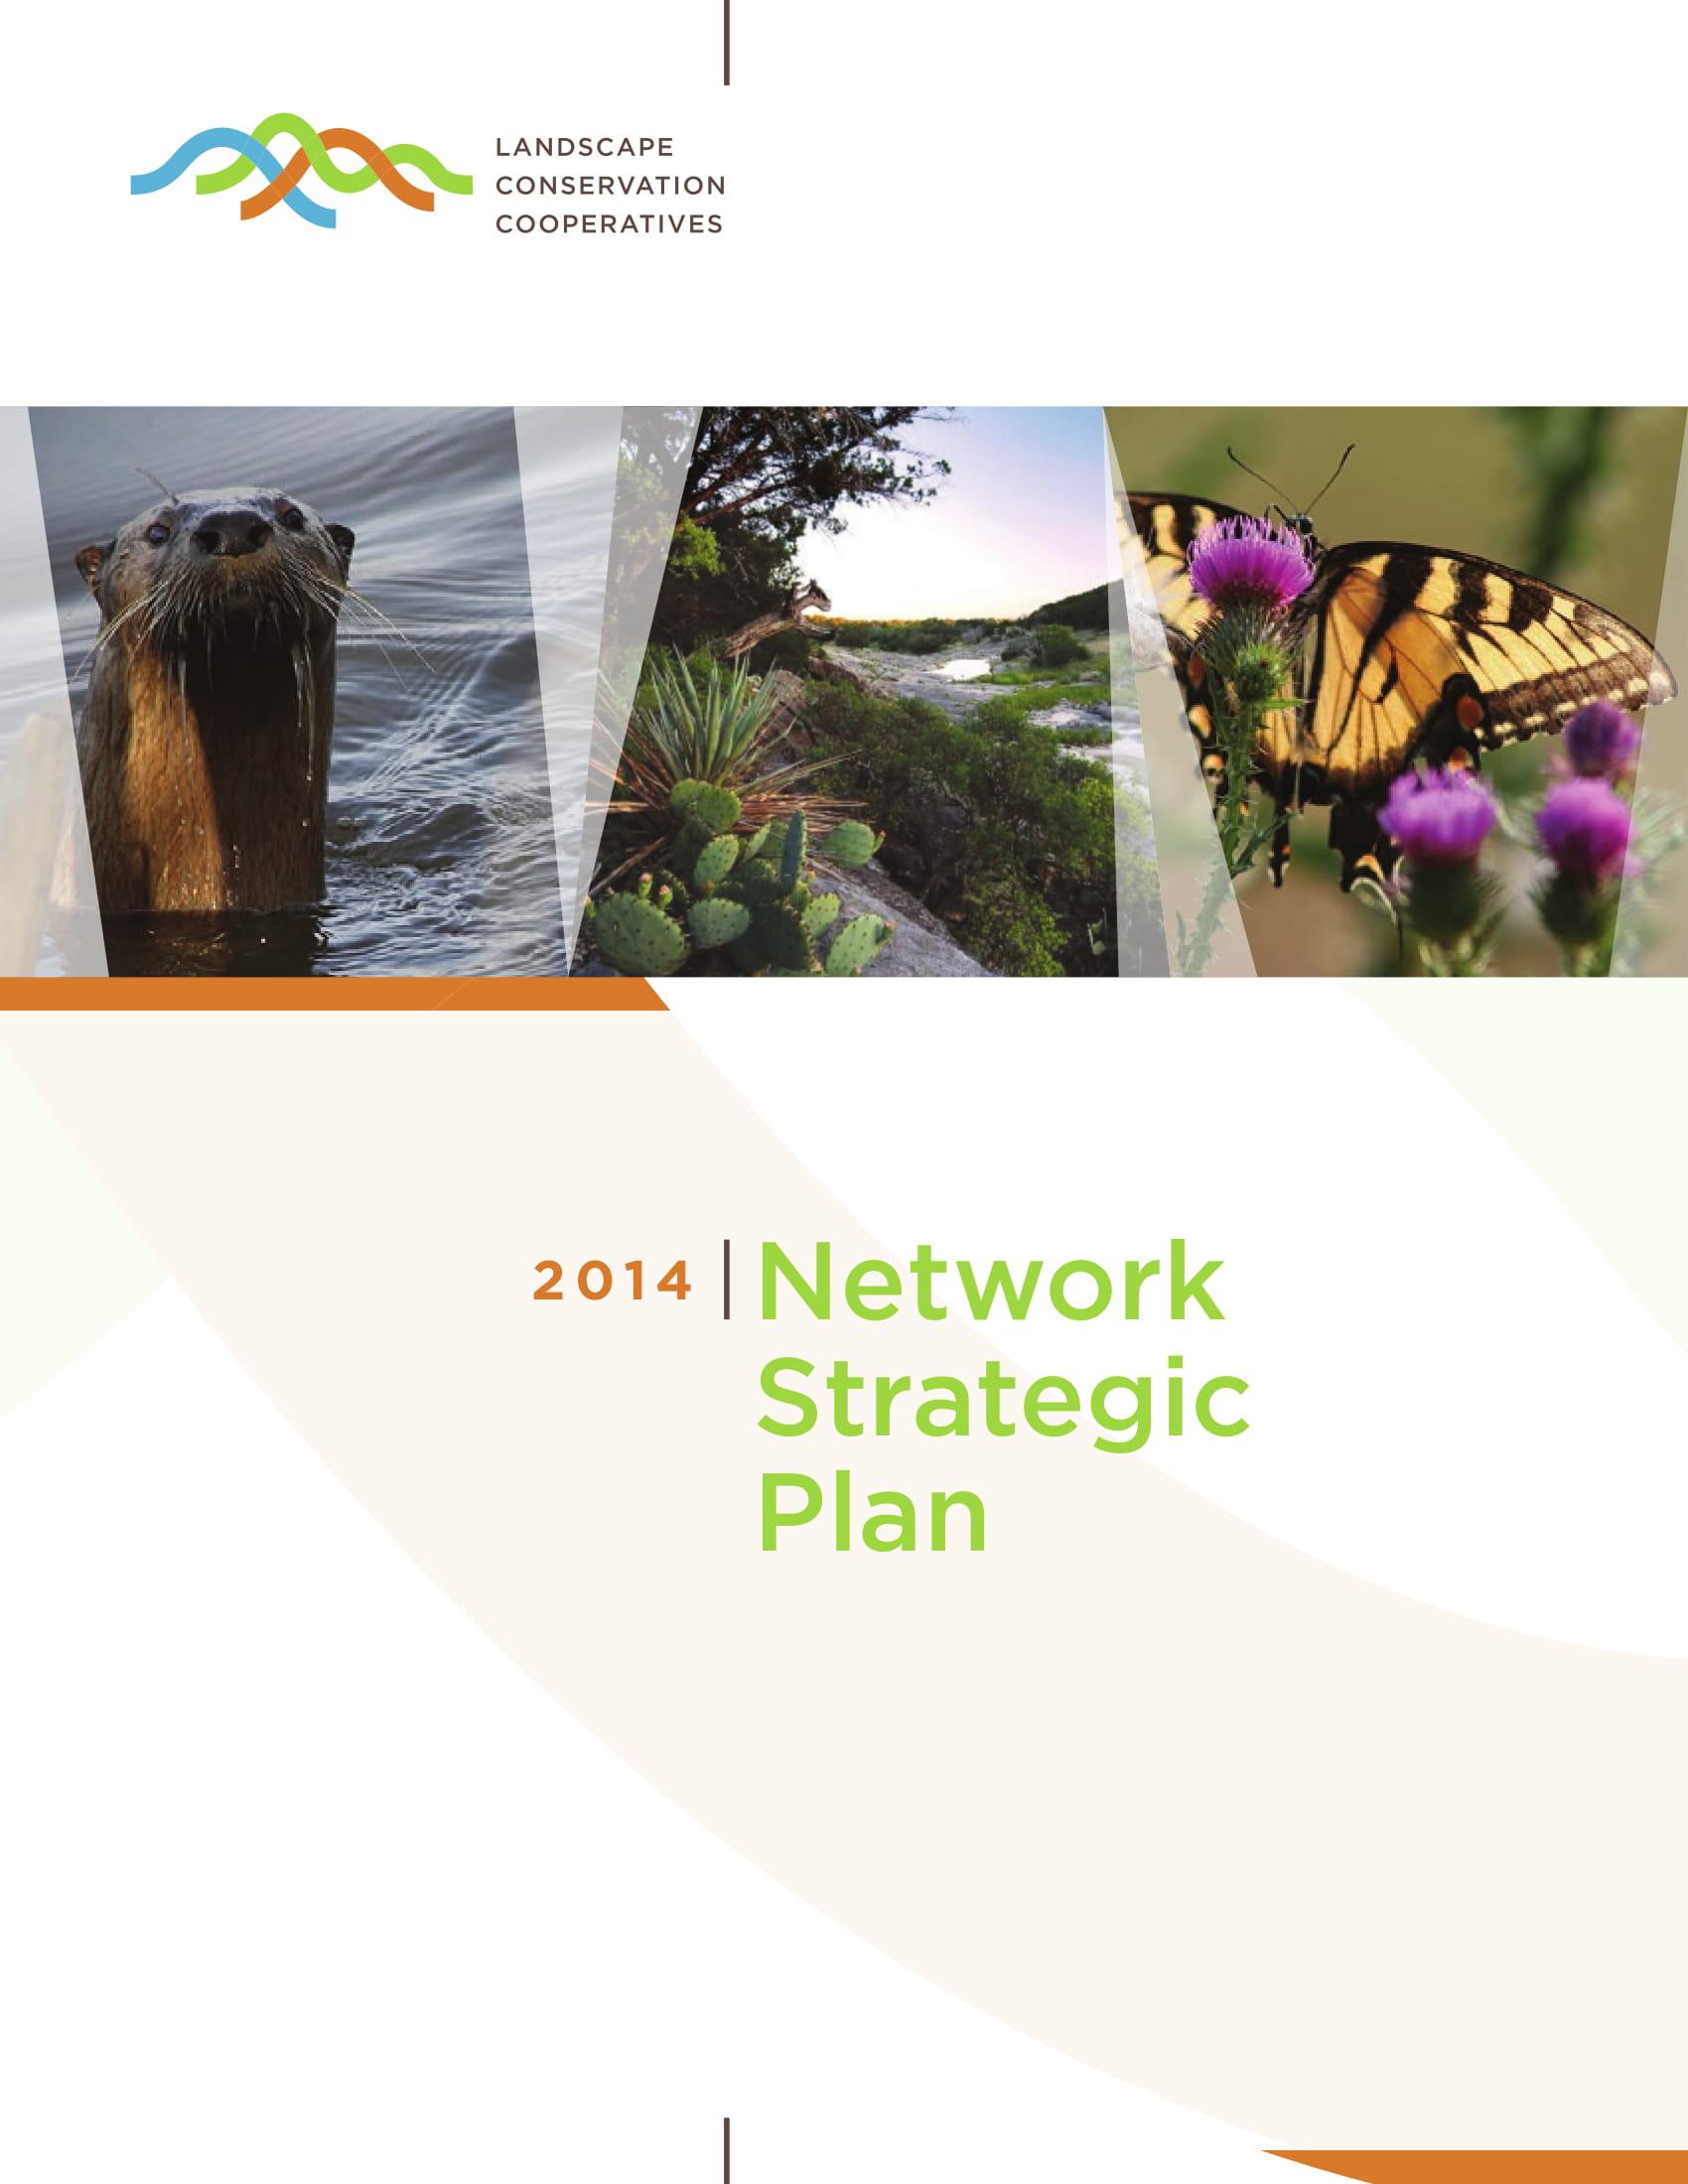 cooperatives network strategic plan example